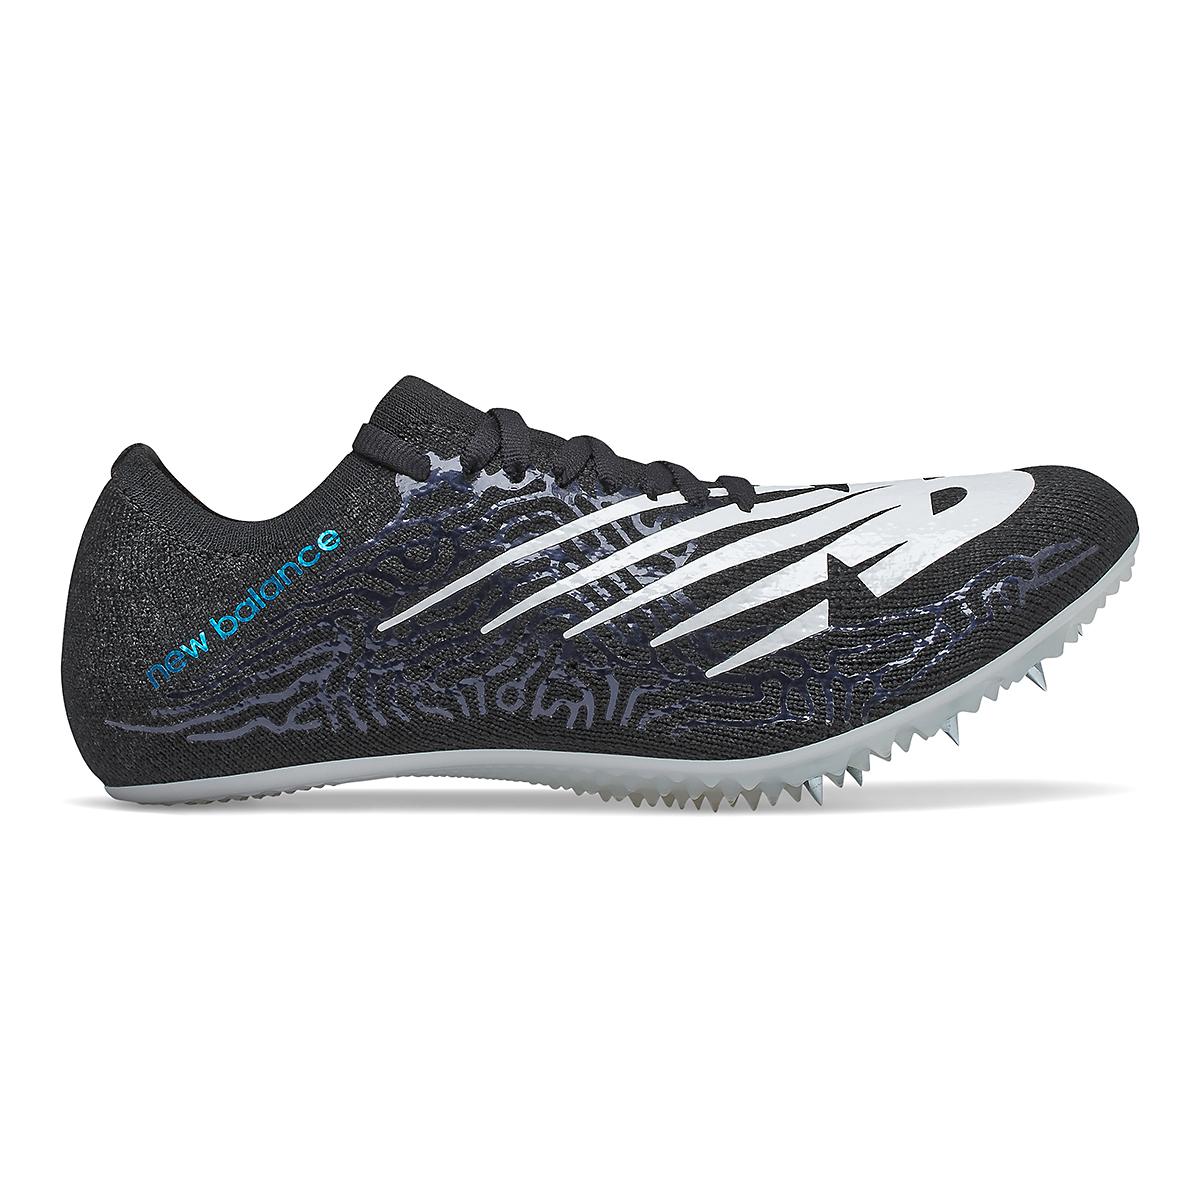 Women's New Balance Sigma Aria Track Spikes - Color: Black/White - Size: 5.5 - Width: Regular, Black/White, large, image 1